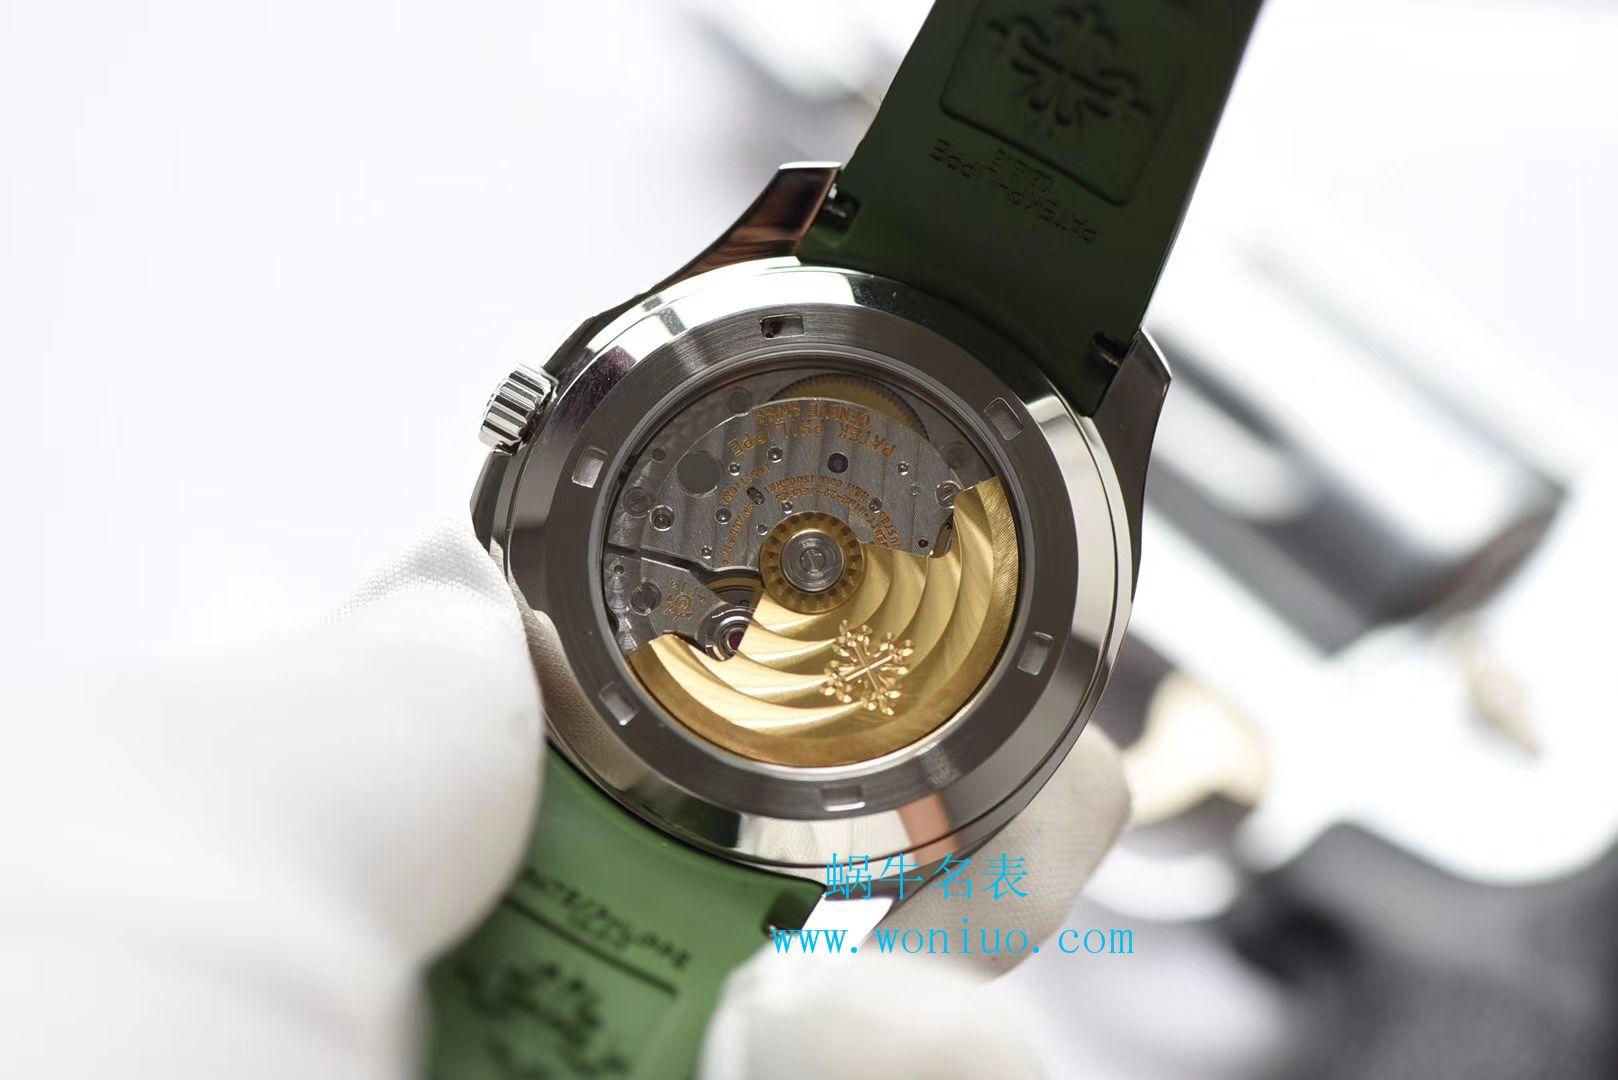 【PF一比一超A高仿手表】百达翡丽AQUANAUT系列5167A-001腕表《百达翡丽手雷》